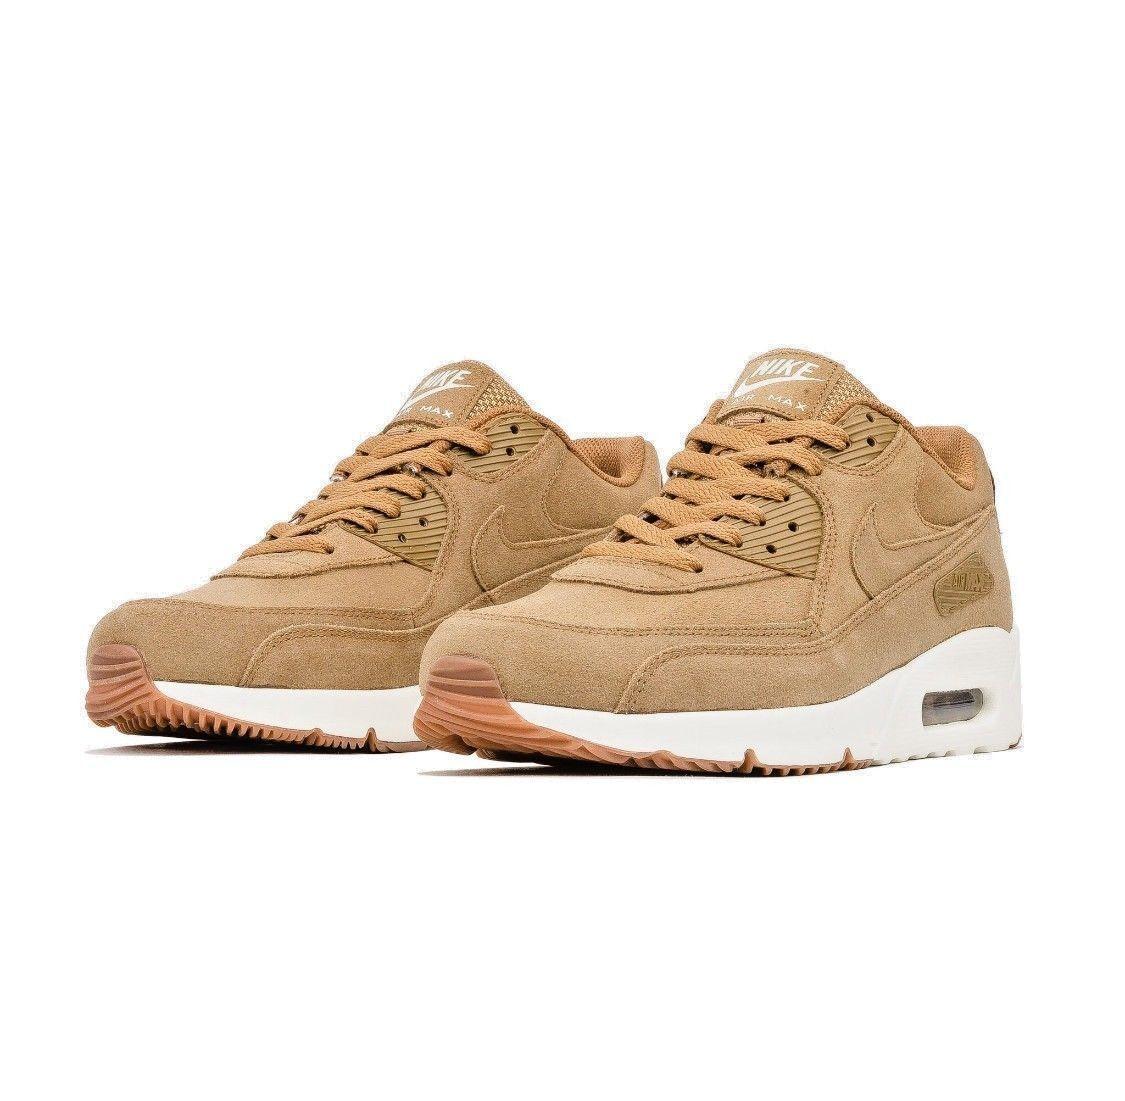 wholesale dealer 423e0 8cbfb Nike Men s Air Max 90 ultra 2.0 LTR Sneakers and 44 similar items. S l1600